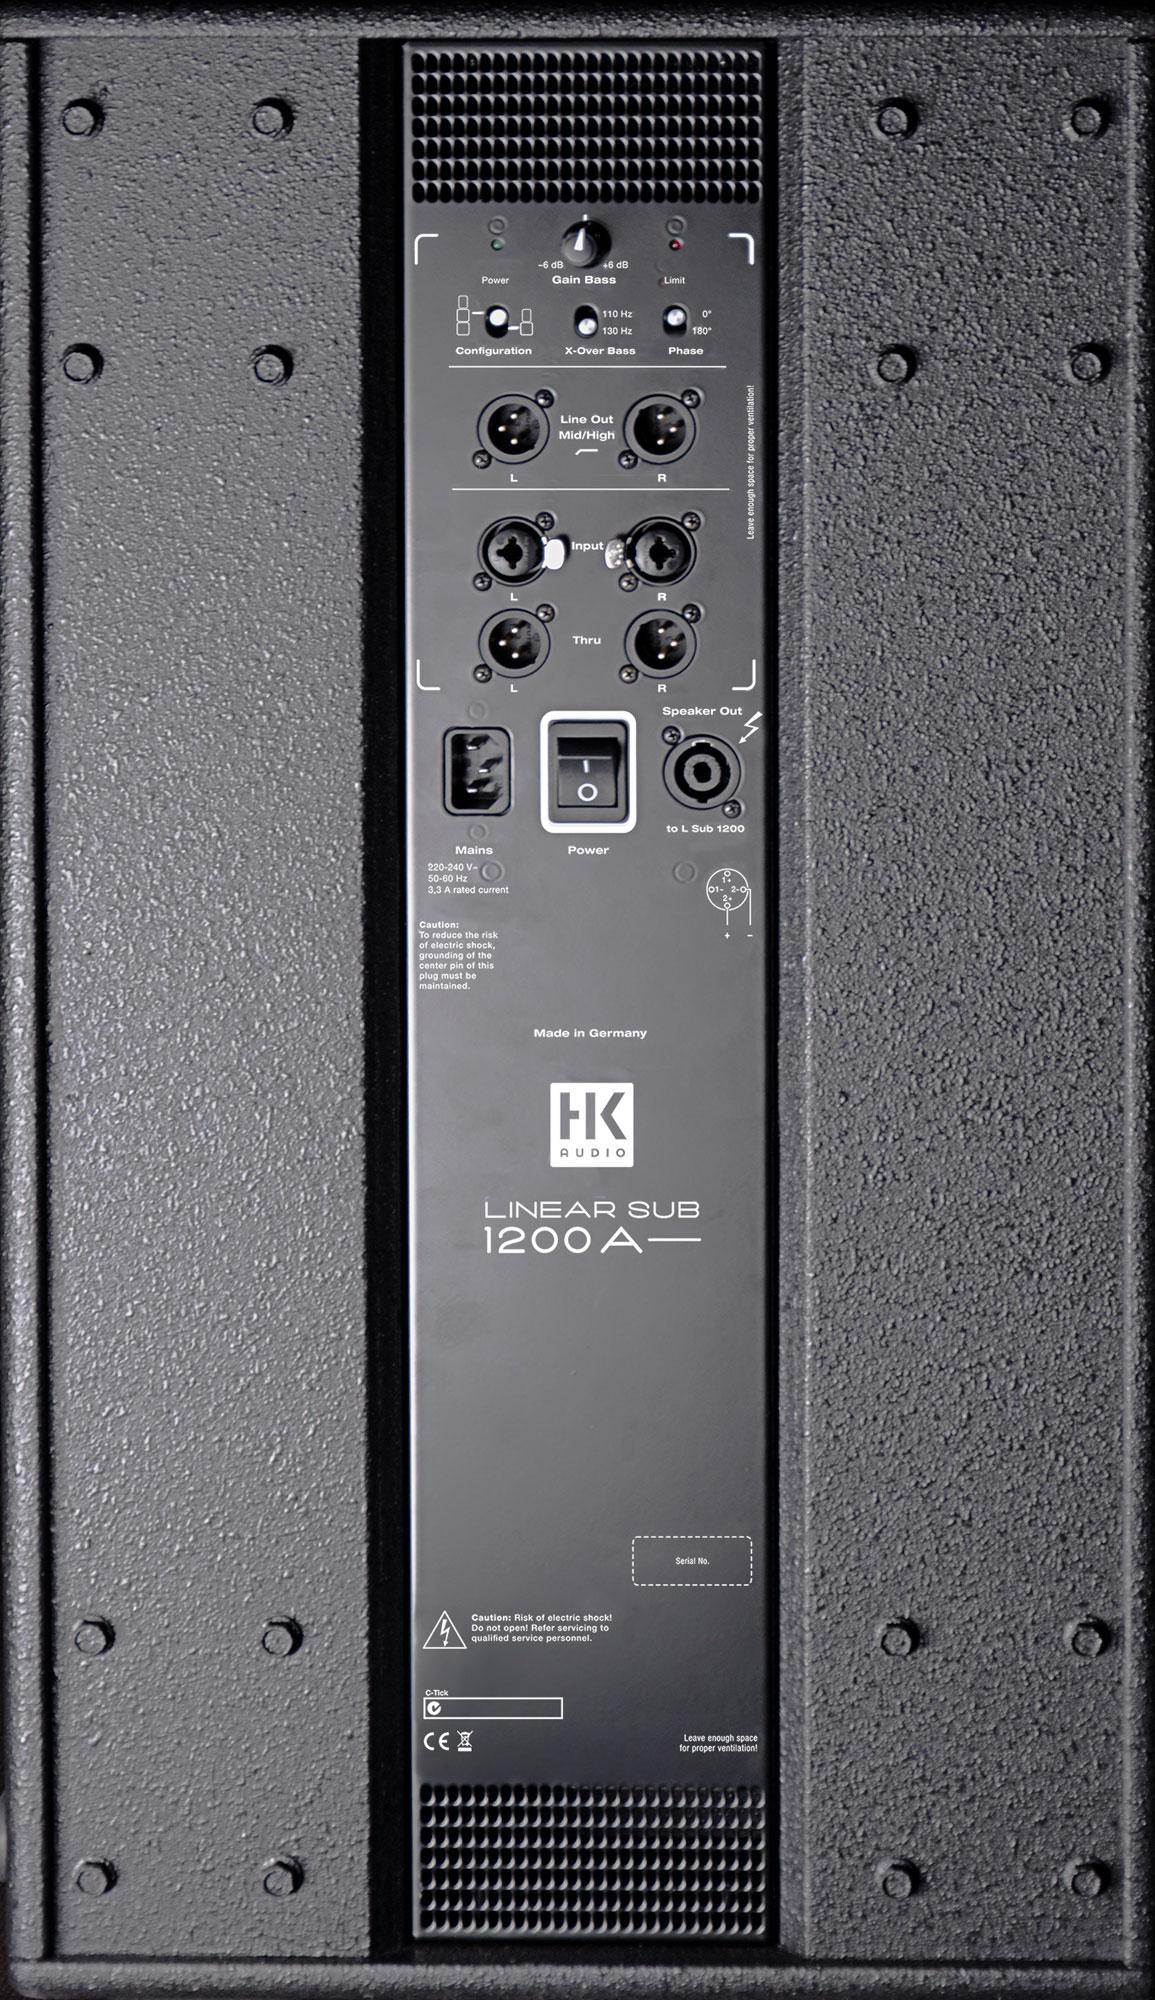 Hk Audio Linear 5 Sub 1200 A